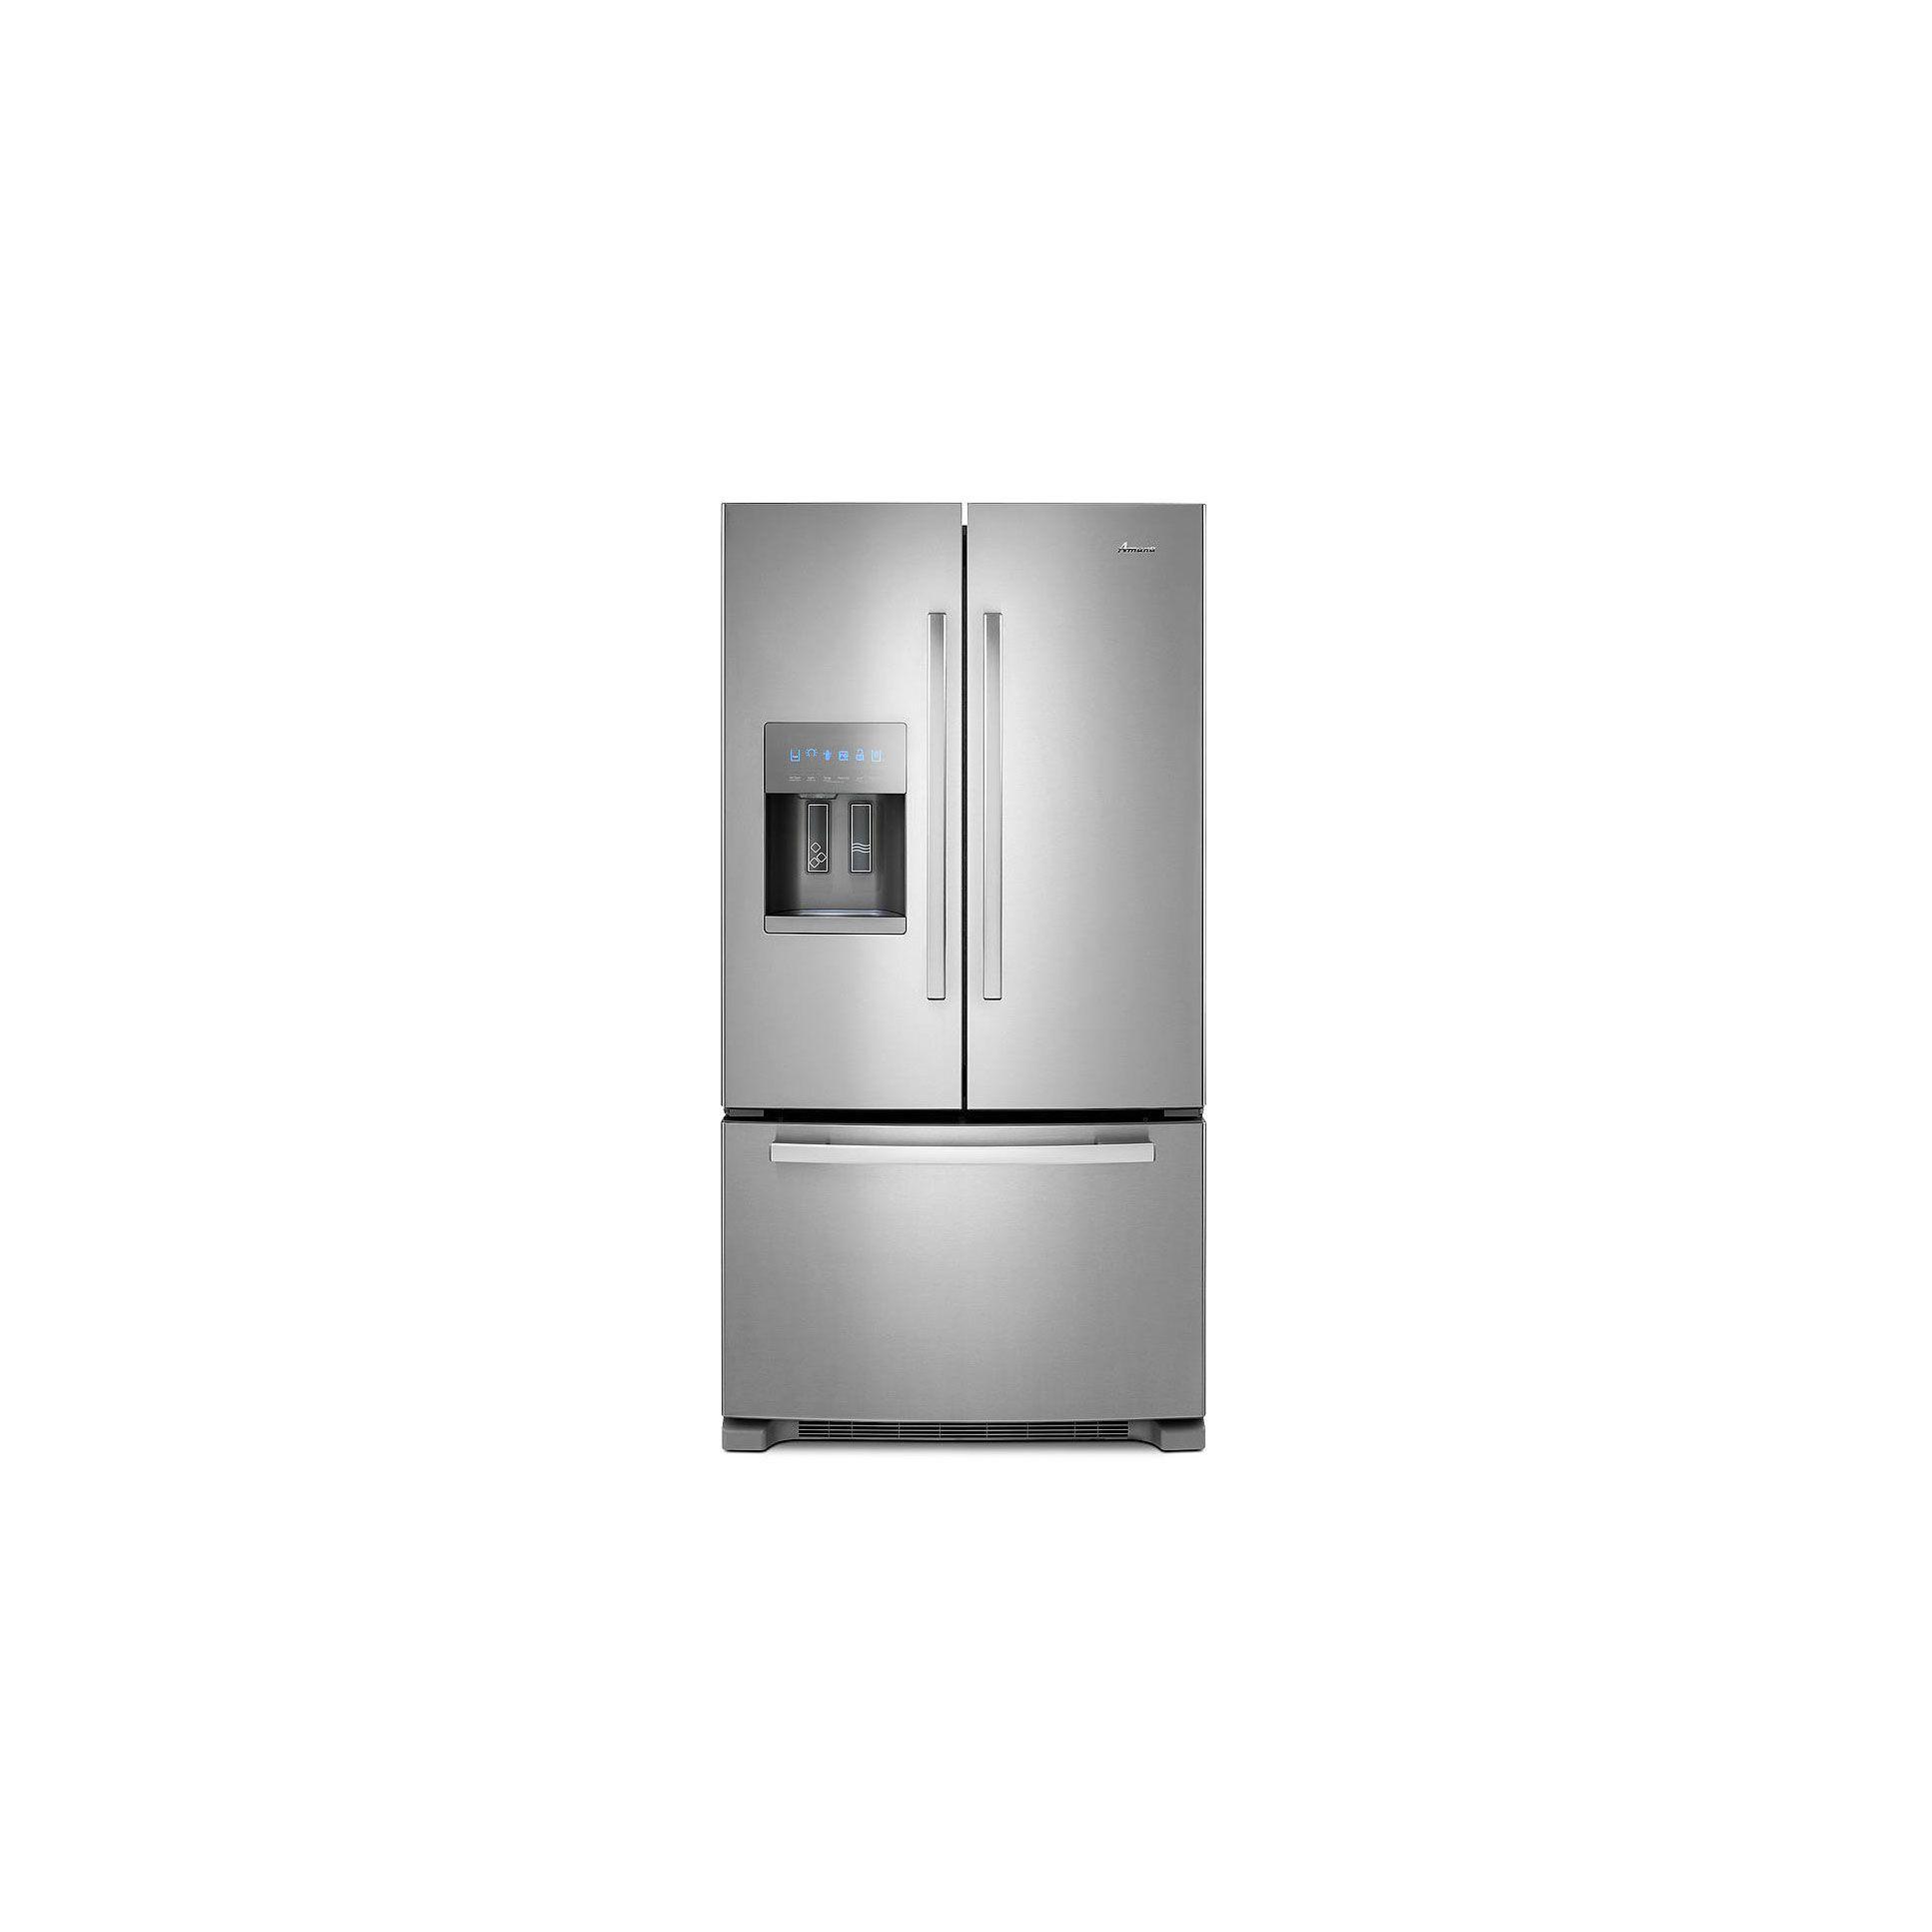 Amana 36-Inch Wide French Door Bottom-Freezer Refrigerator